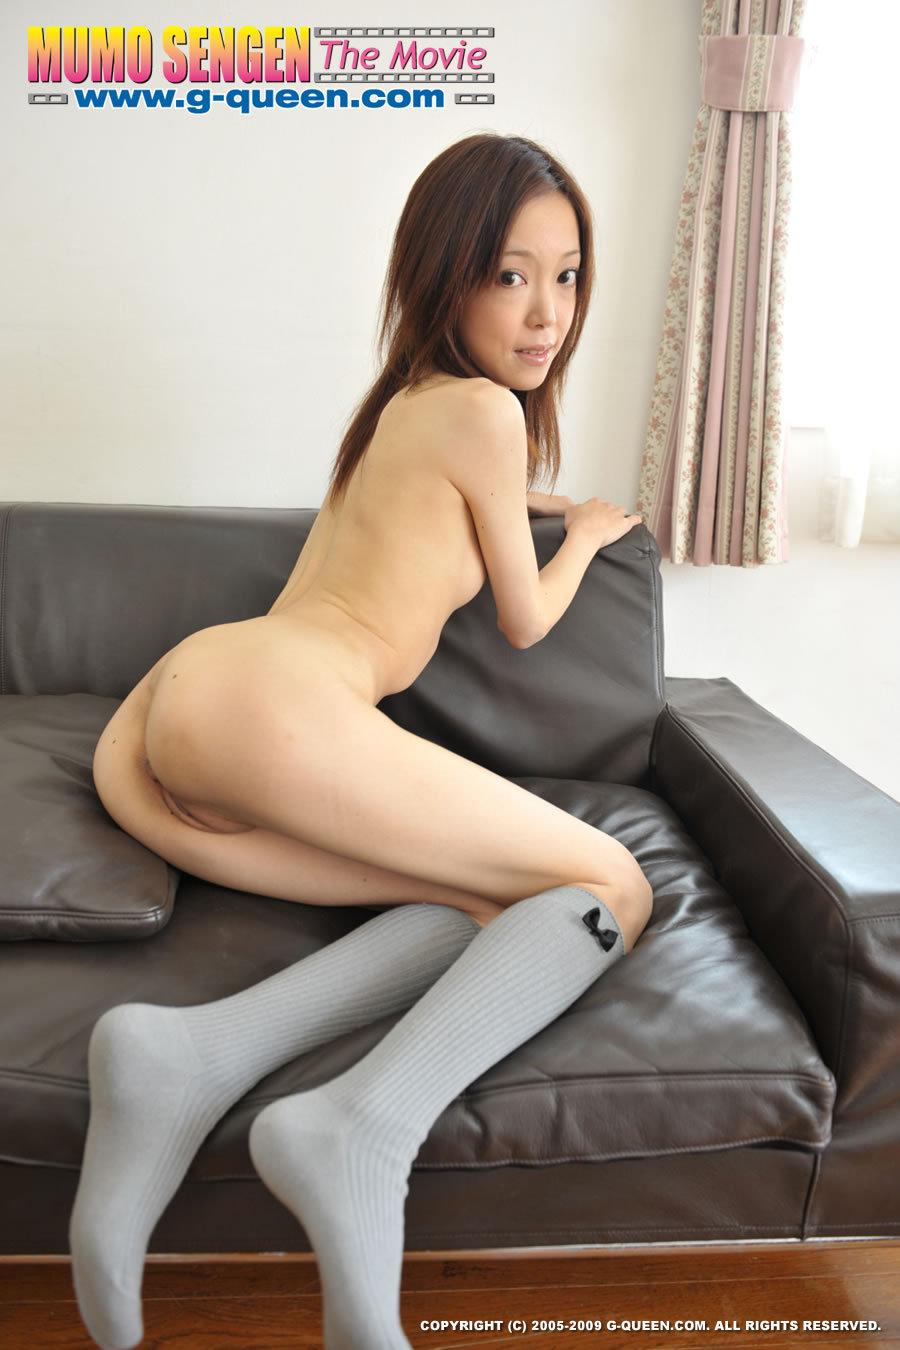 emi konishi g queen mumosengen shaved pussy